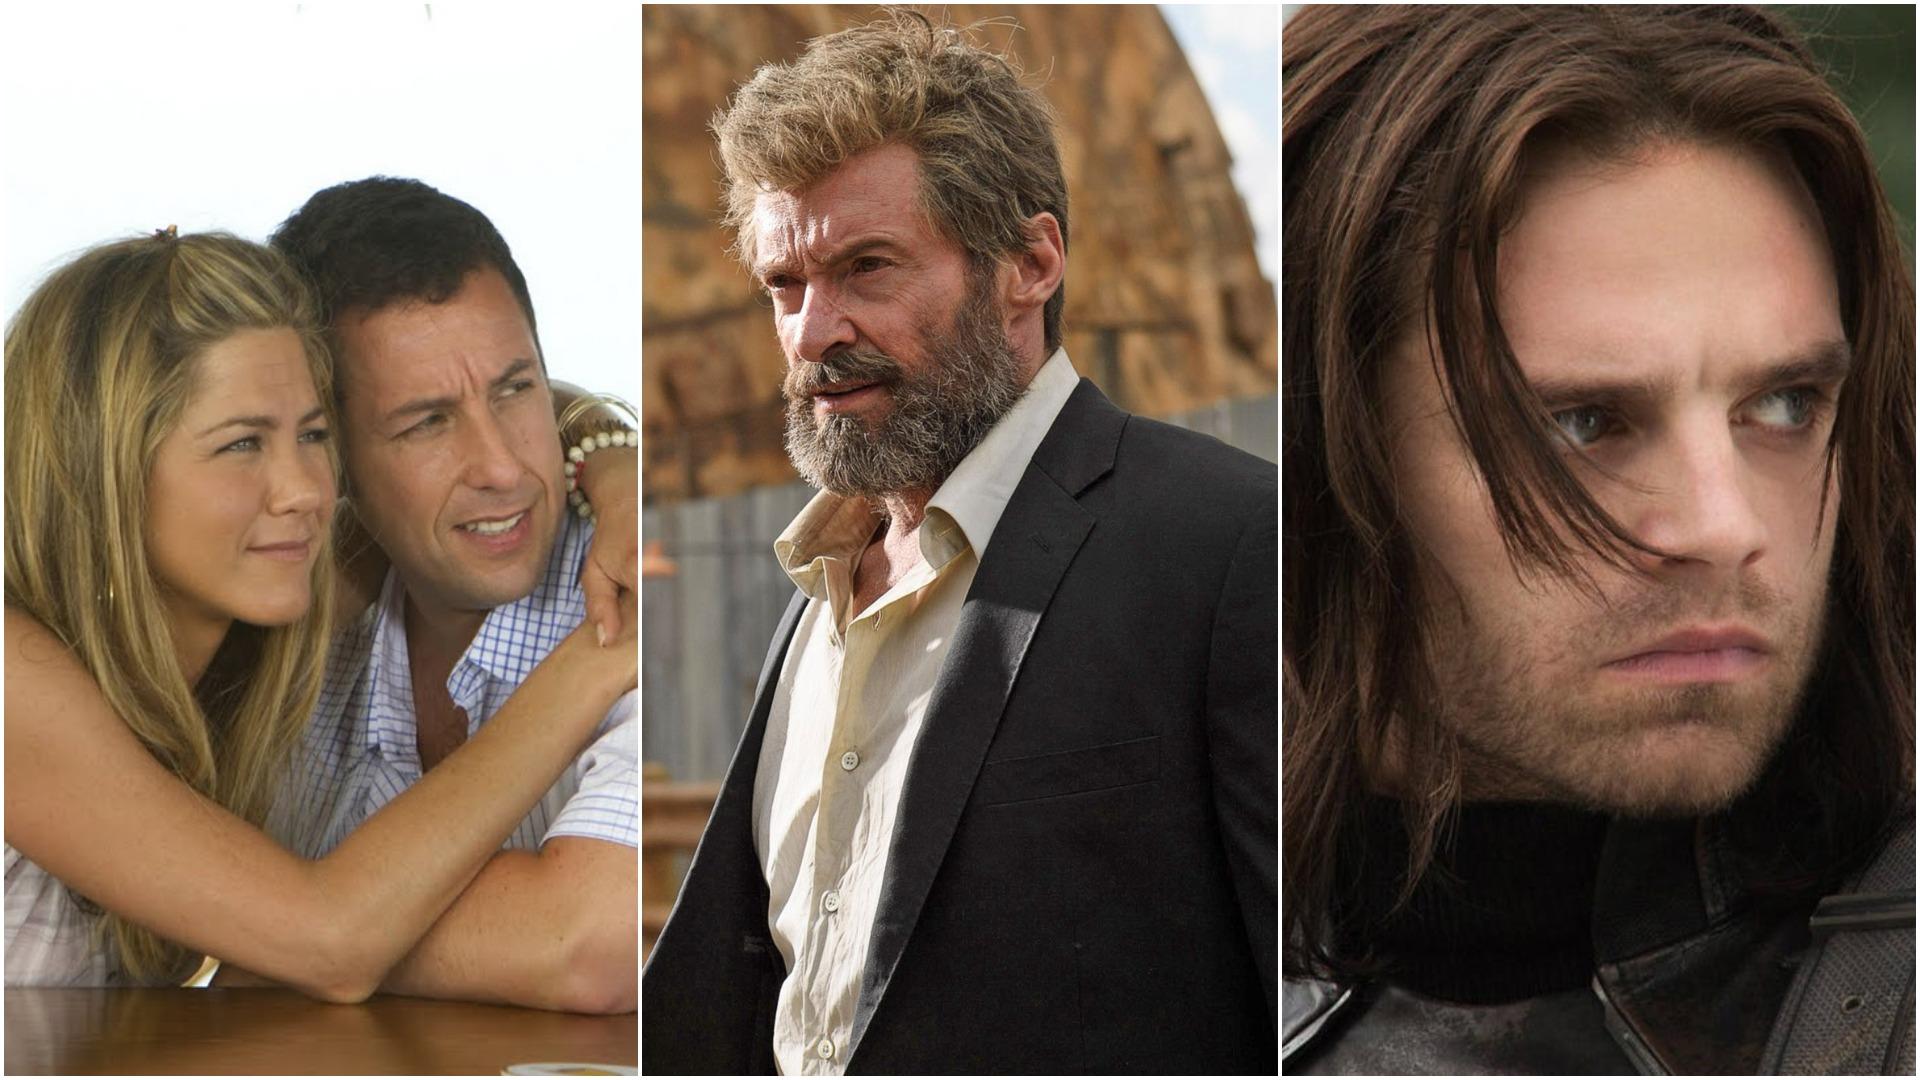 Casting News: Sandler & Aniston Head to Netflix, Jackman